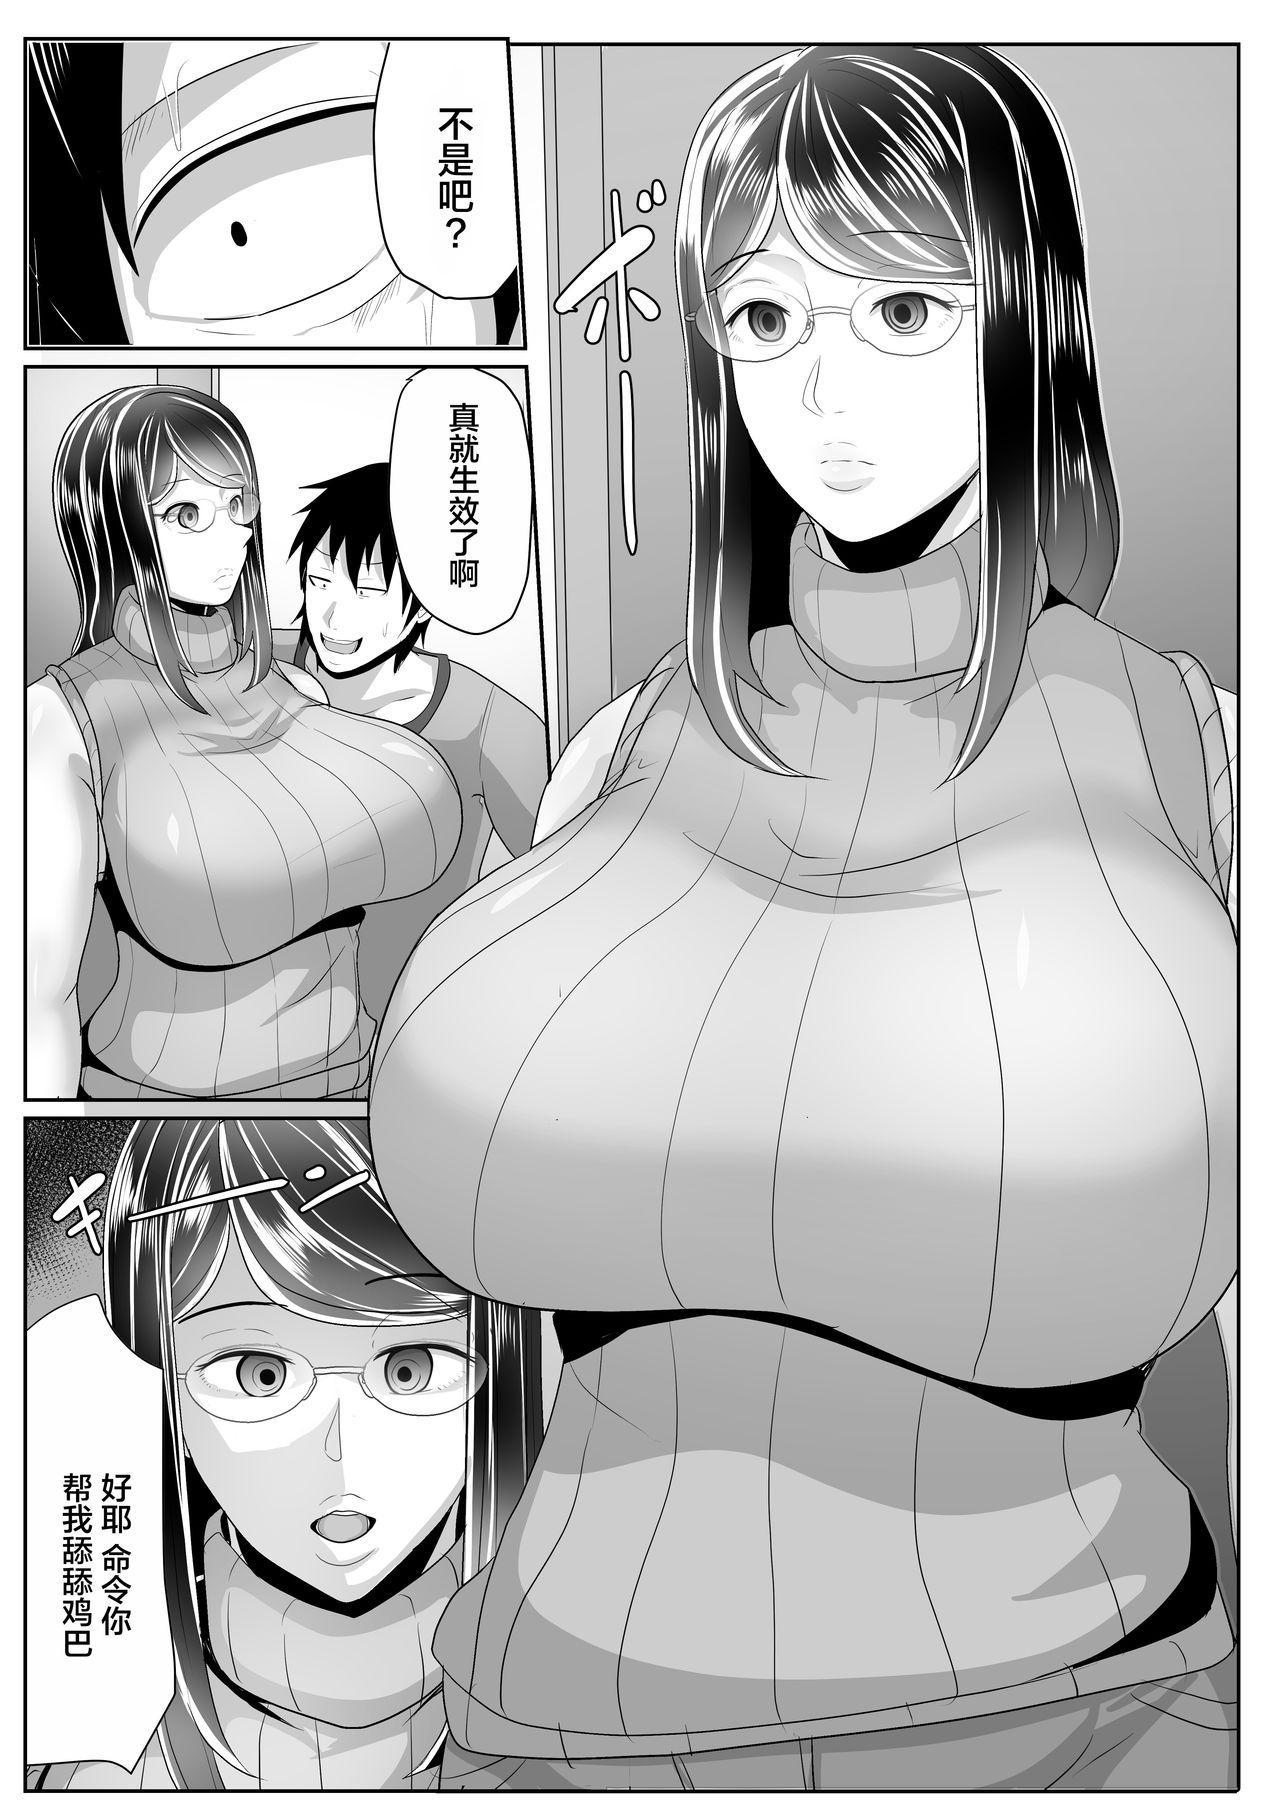 [Akikan] Kaa-san Senyou Saimin Appli[Chinese]【不可视汉化】 7